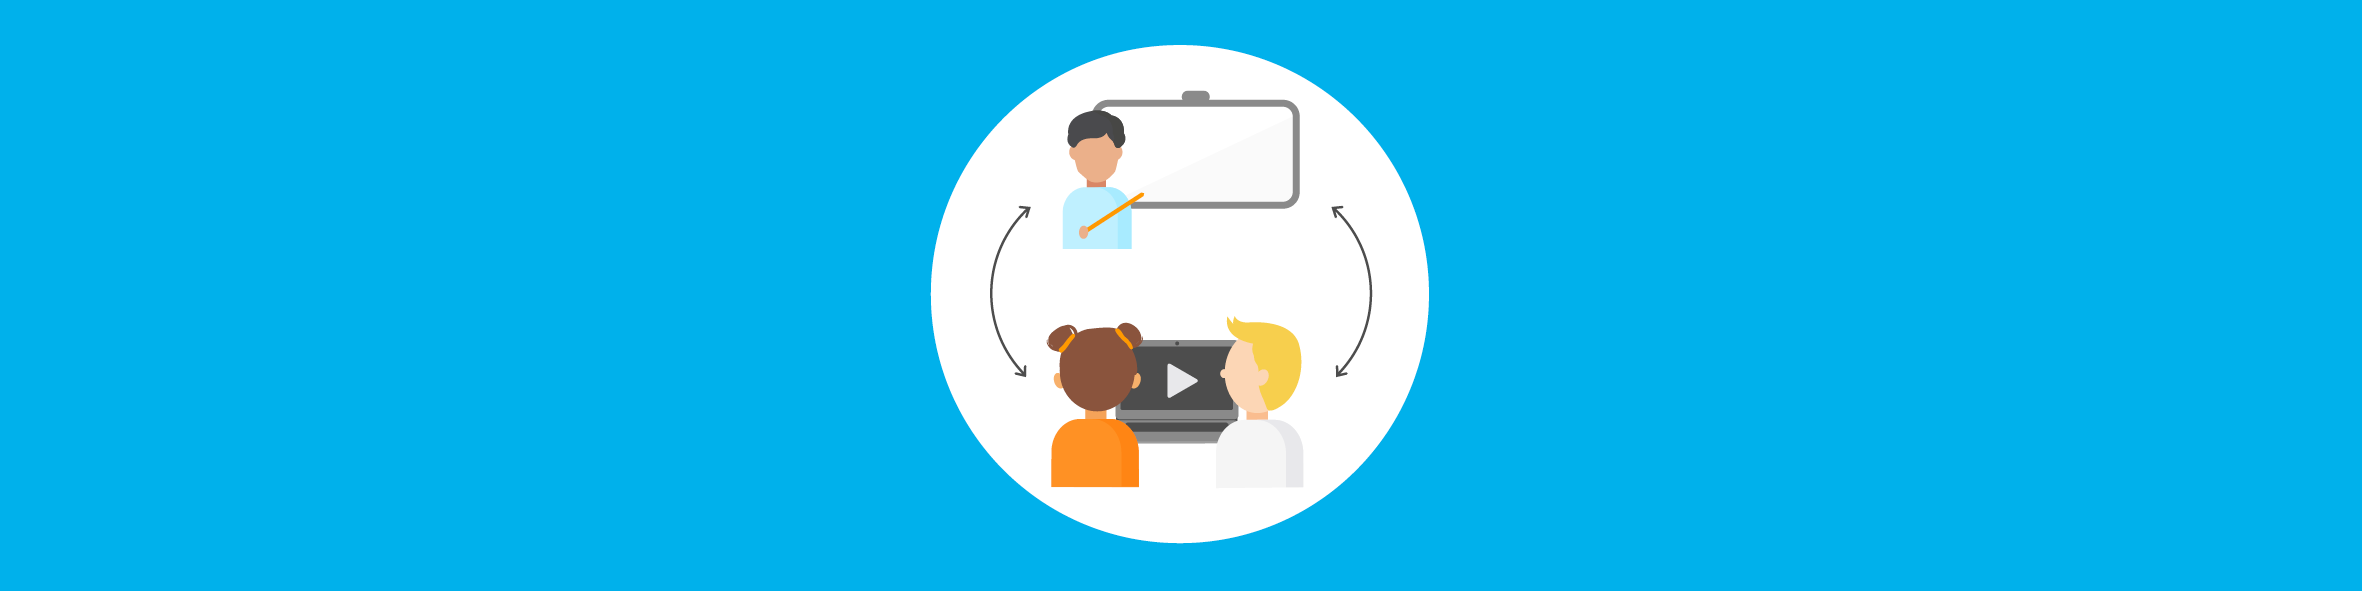 Flipping the classroom - Cloudwise Academy header trainingsaanbod